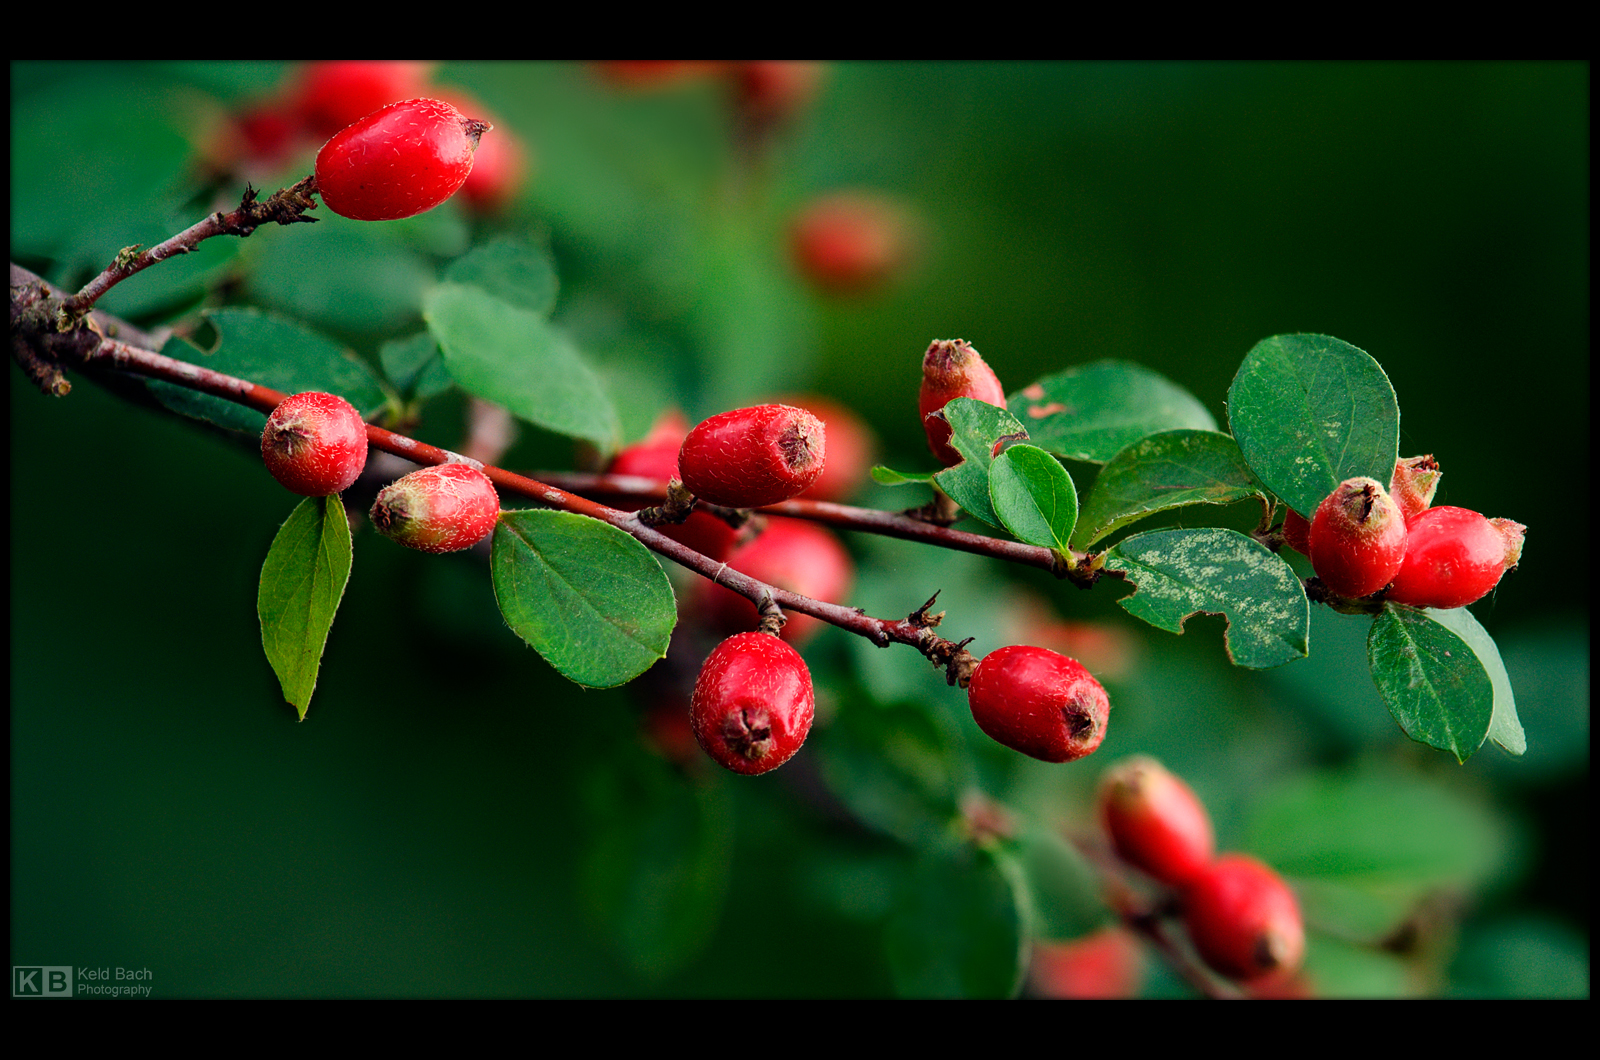 Autumn is Nearing by KeldBach